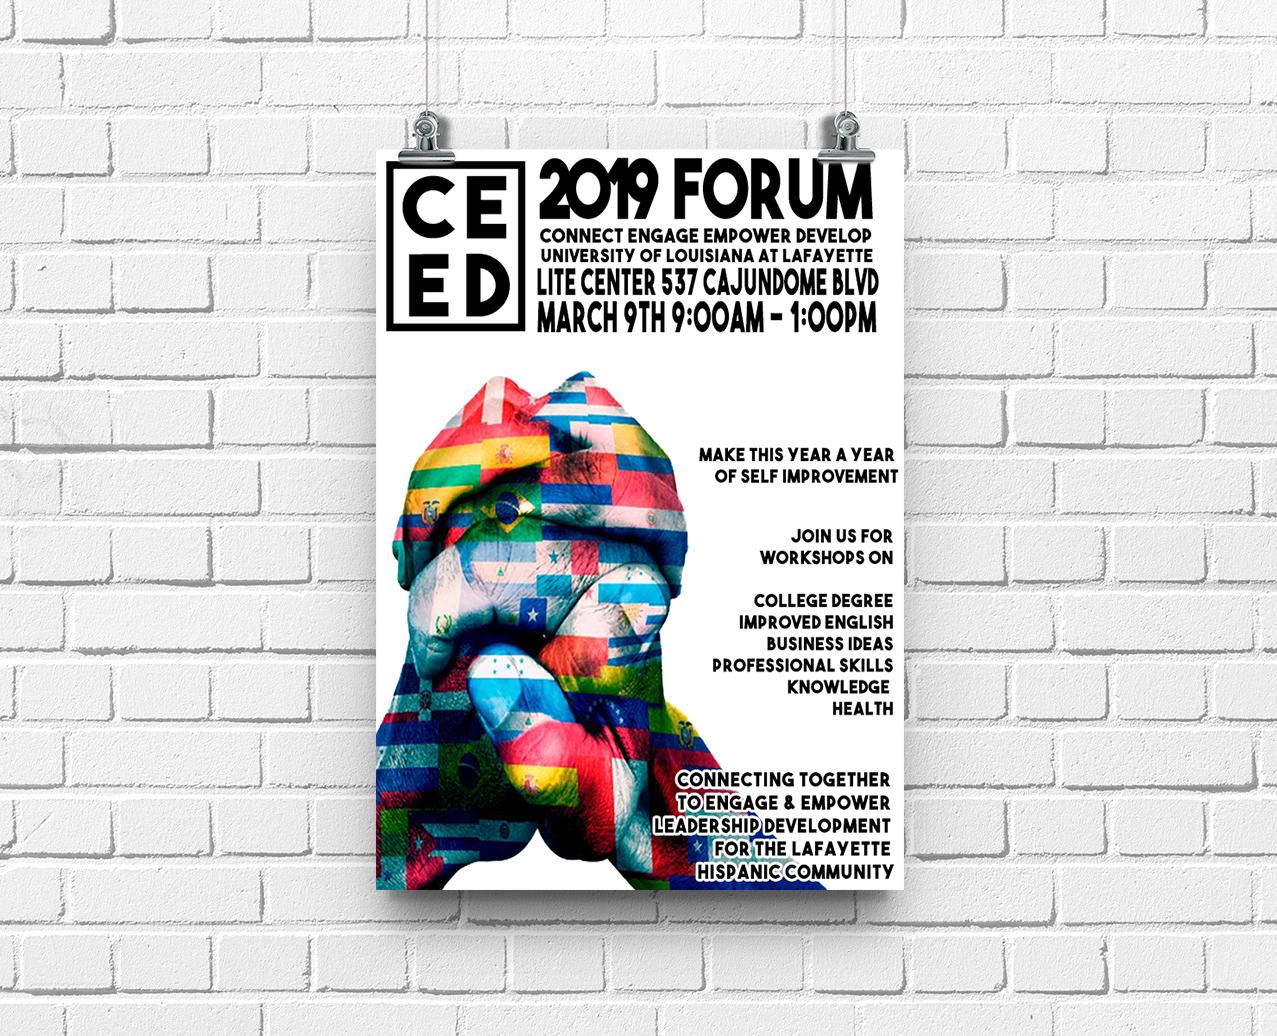 Emerald City Digital | CEED Forum | Poster